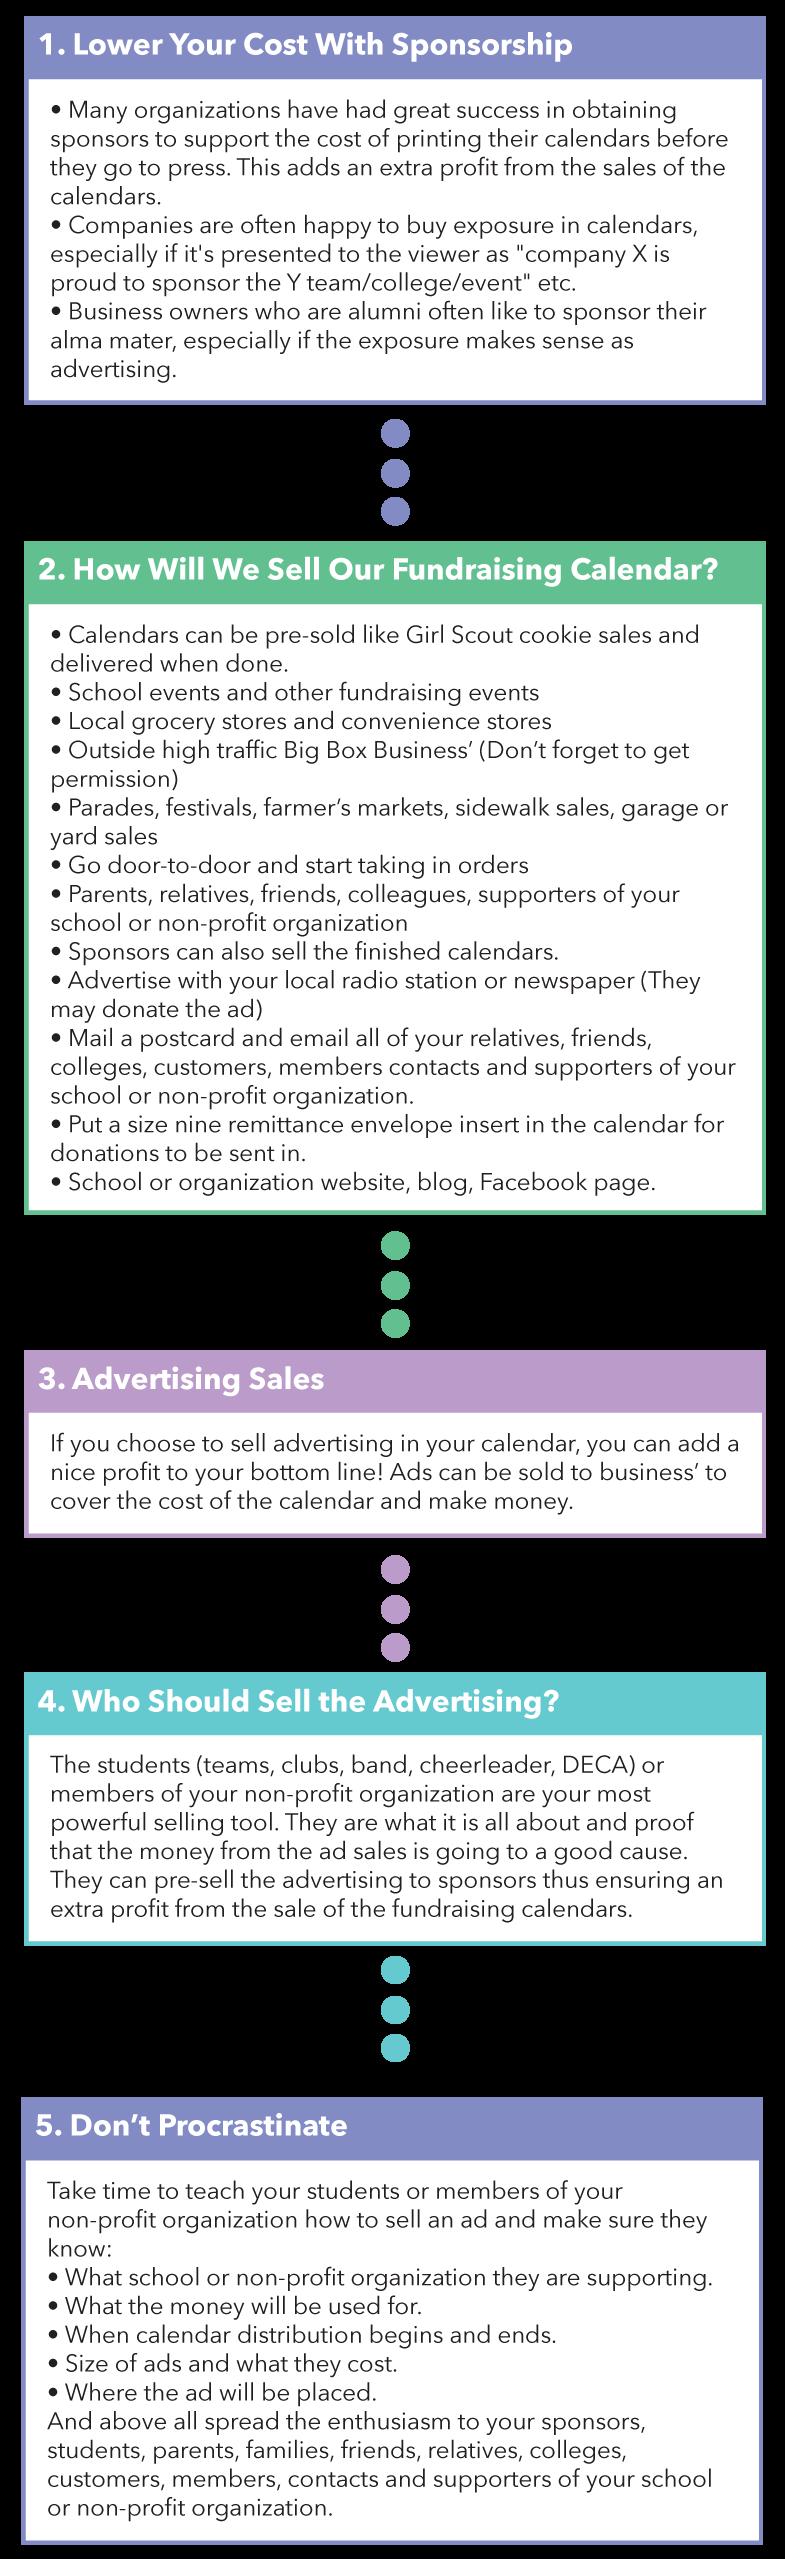 Advertising Tips for your next calendar!